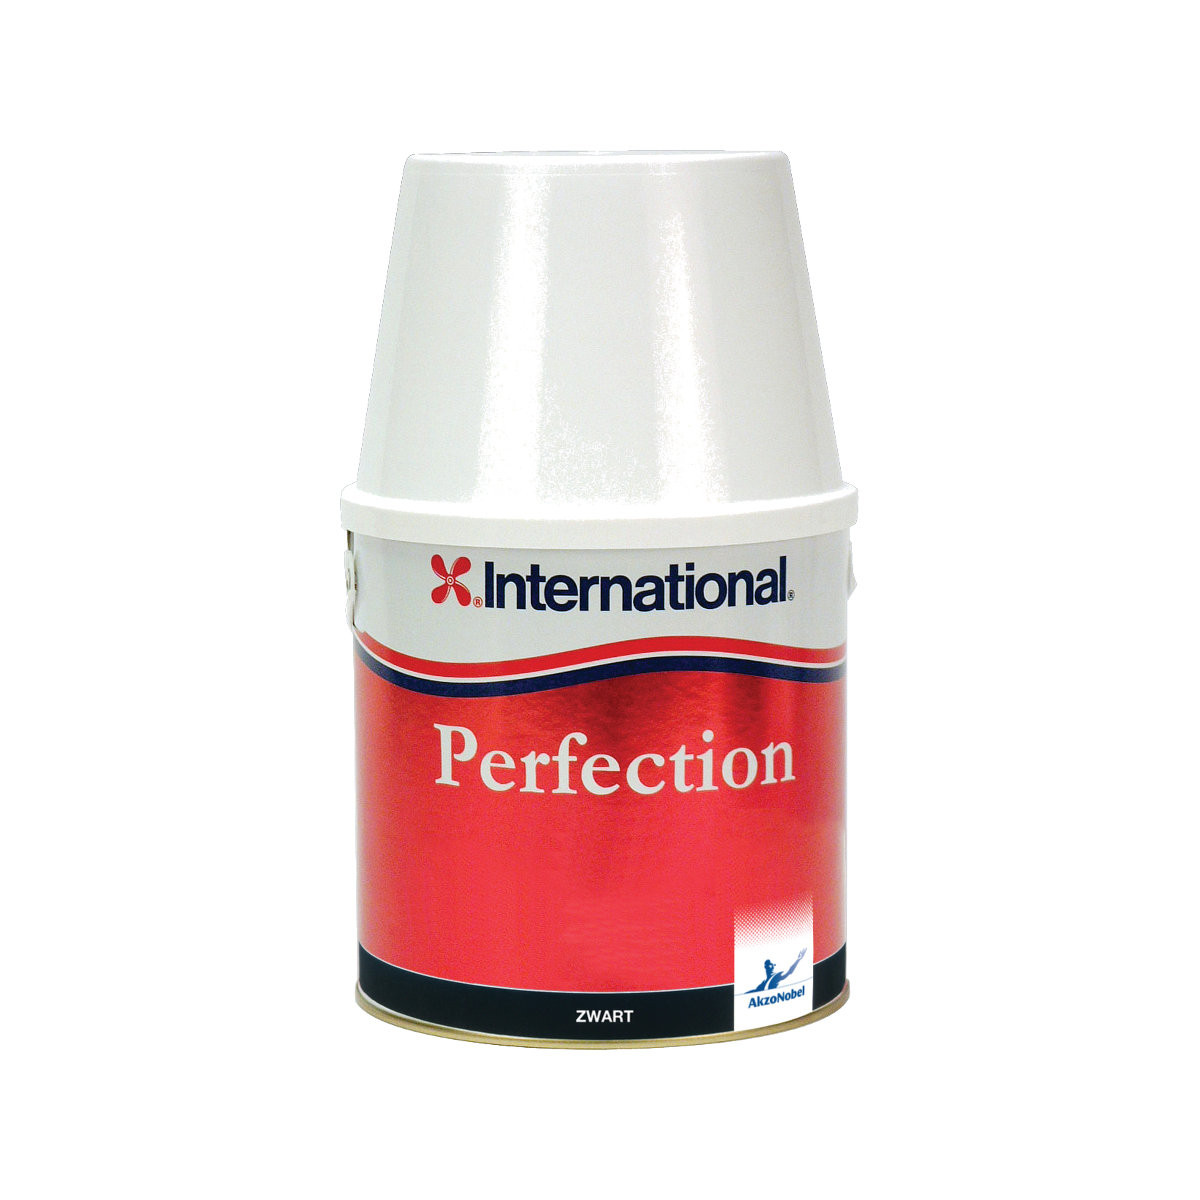 International Perfection aflak - blauw 990, 2250ml